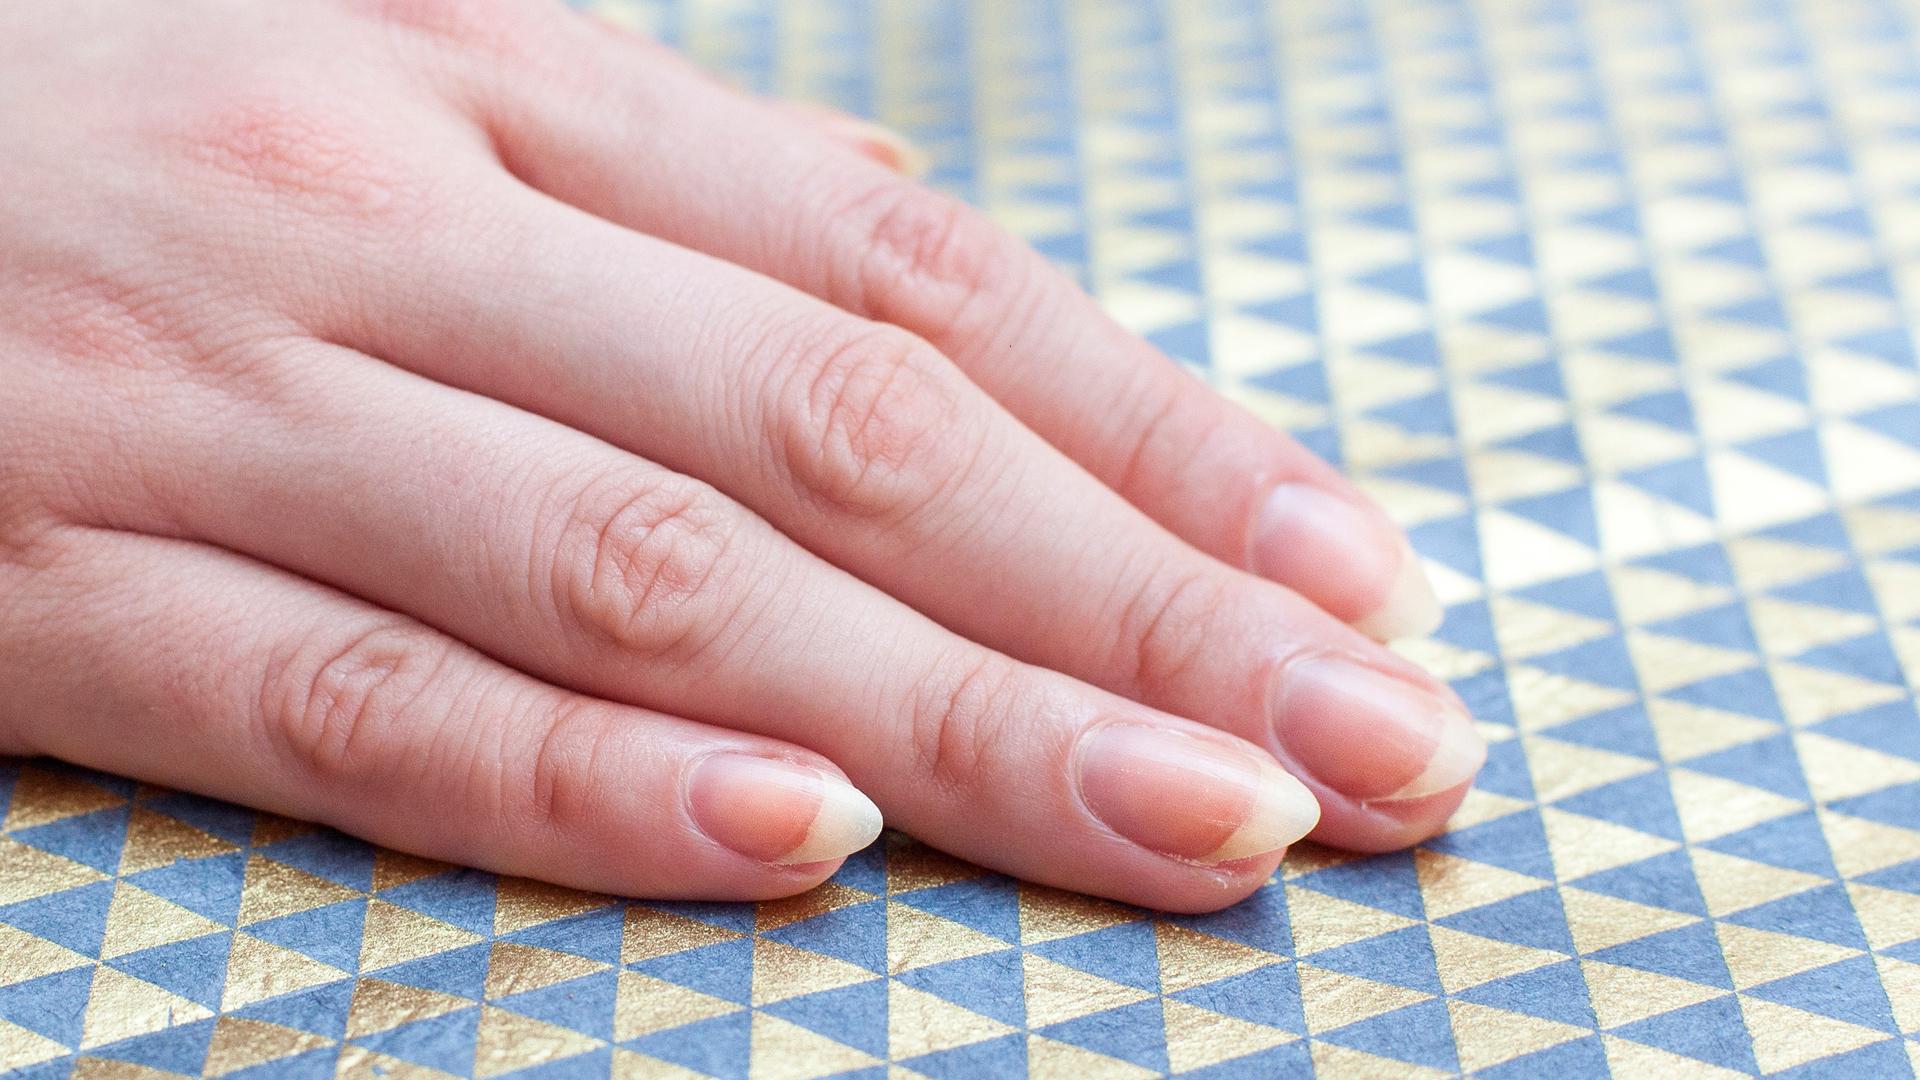 How to create an almond nail shape